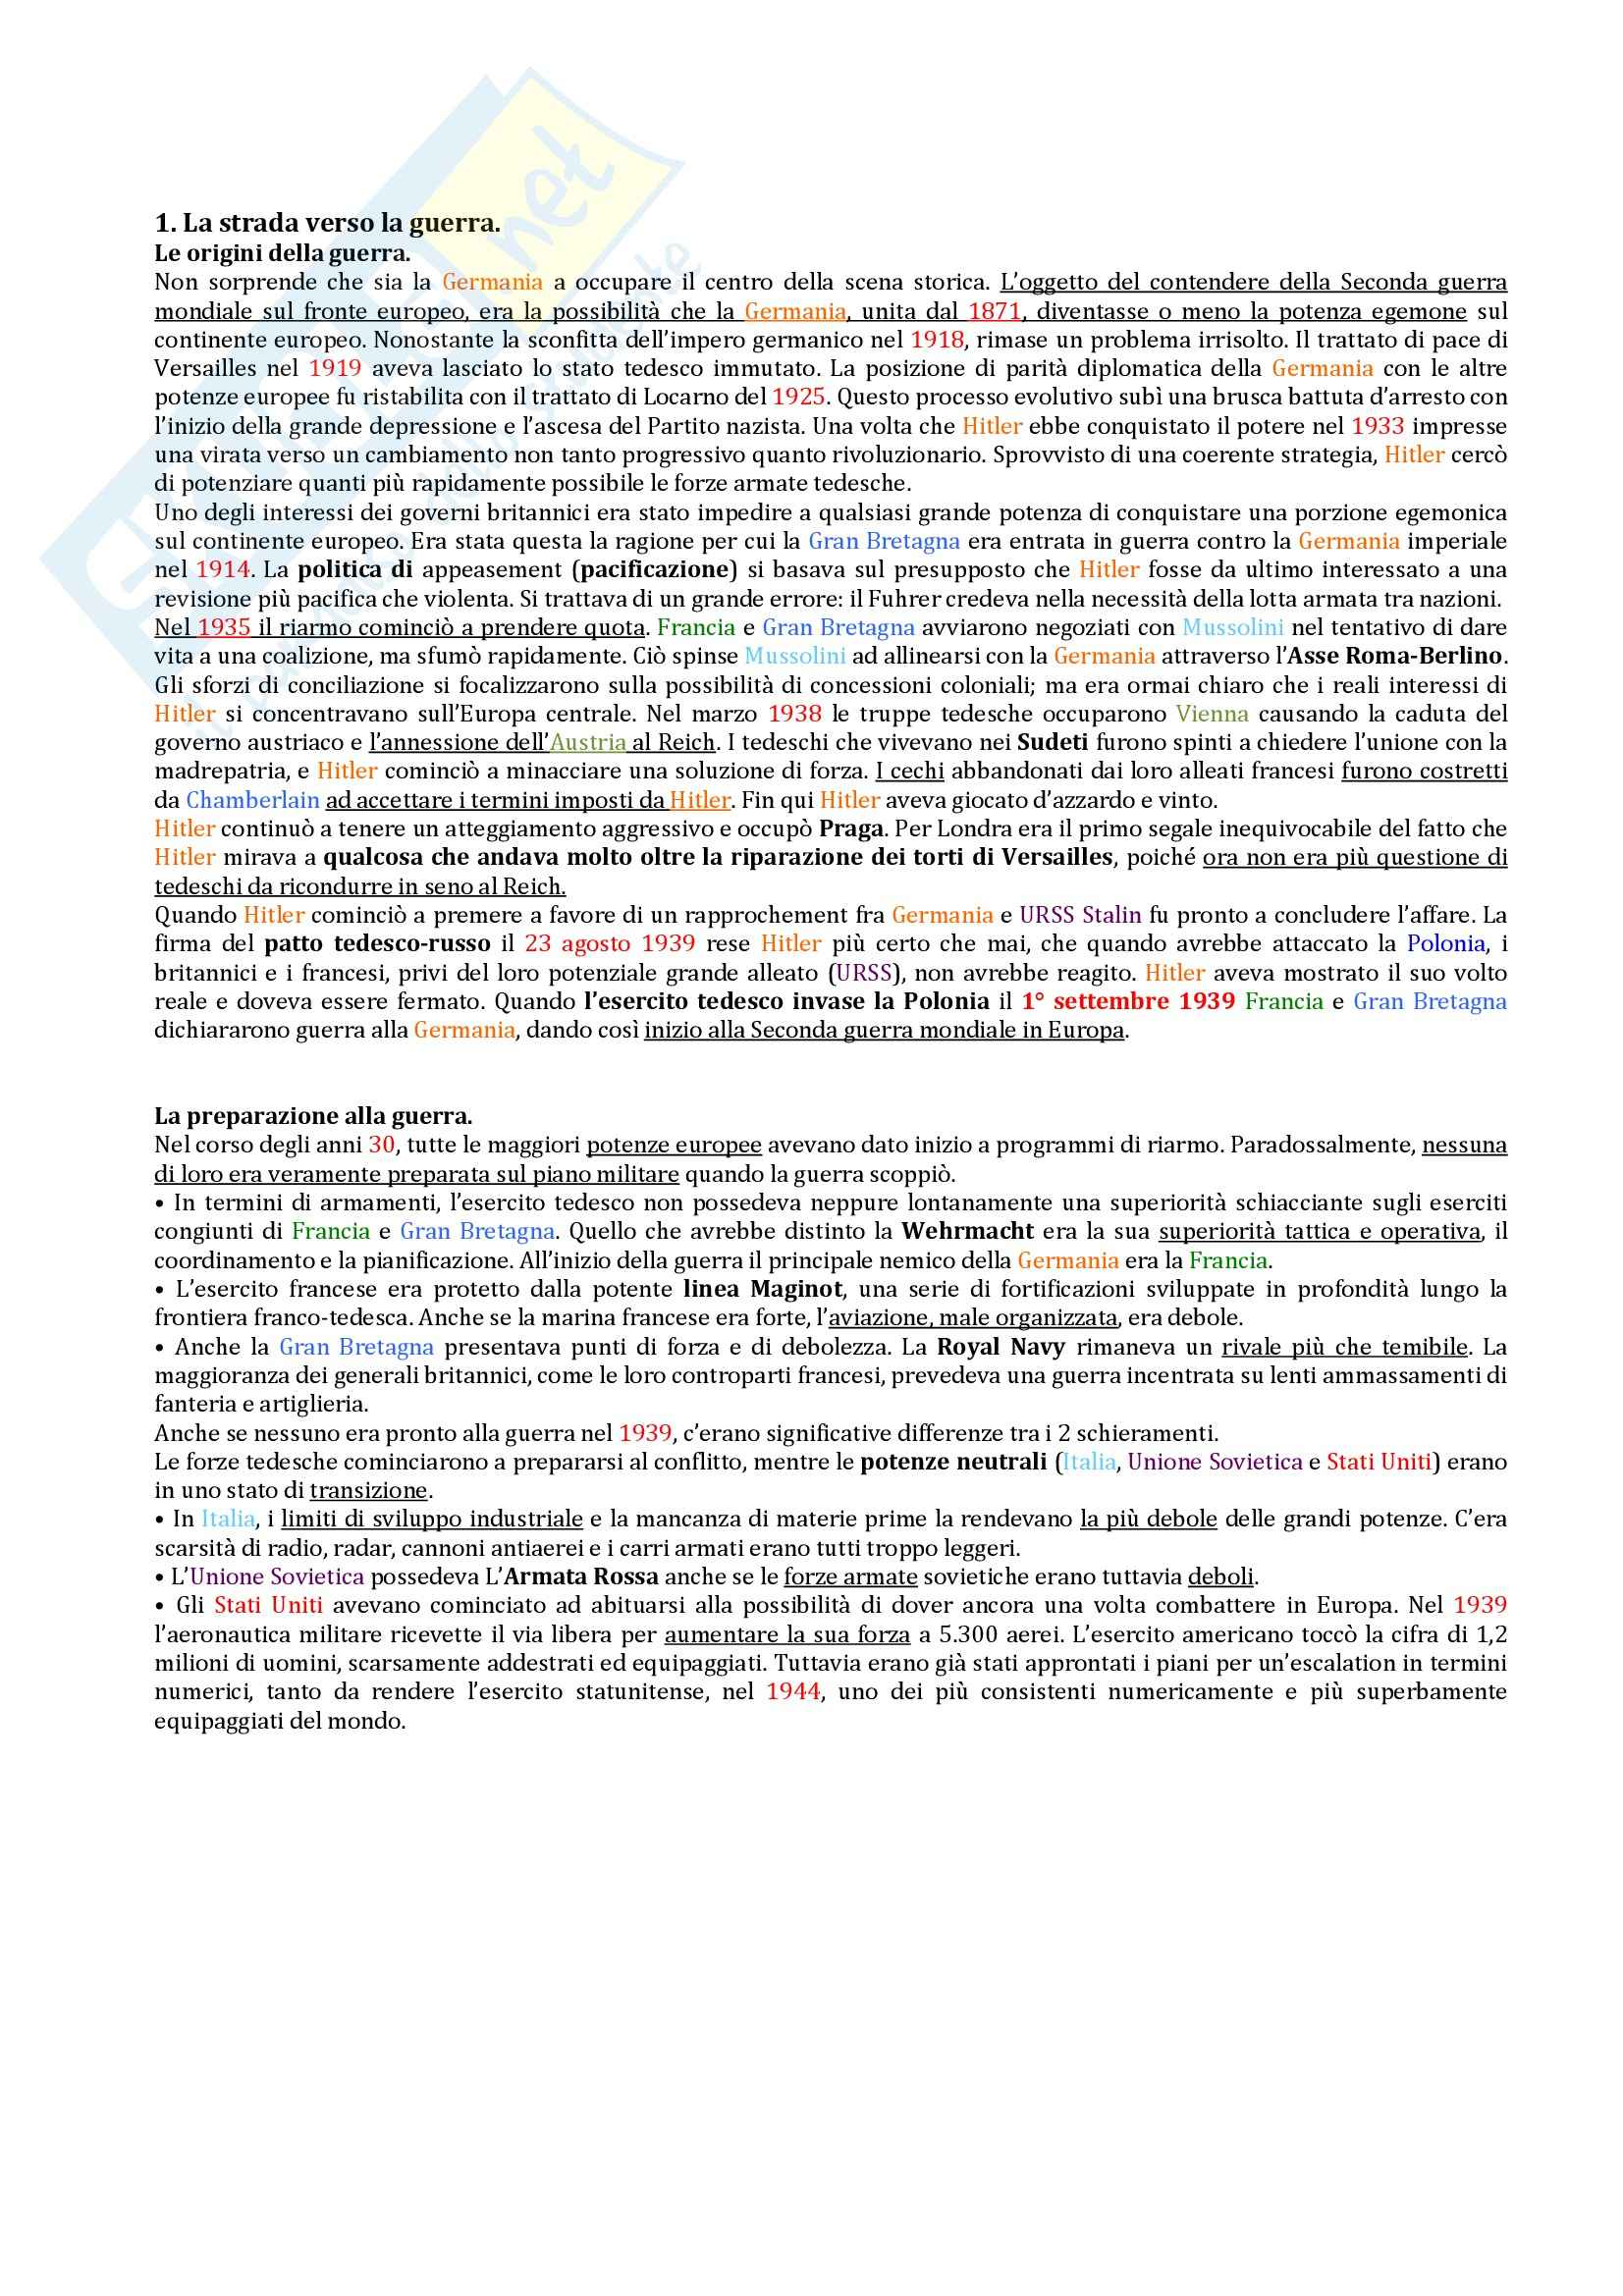 appunto A. Malfitano Storia contemporanea